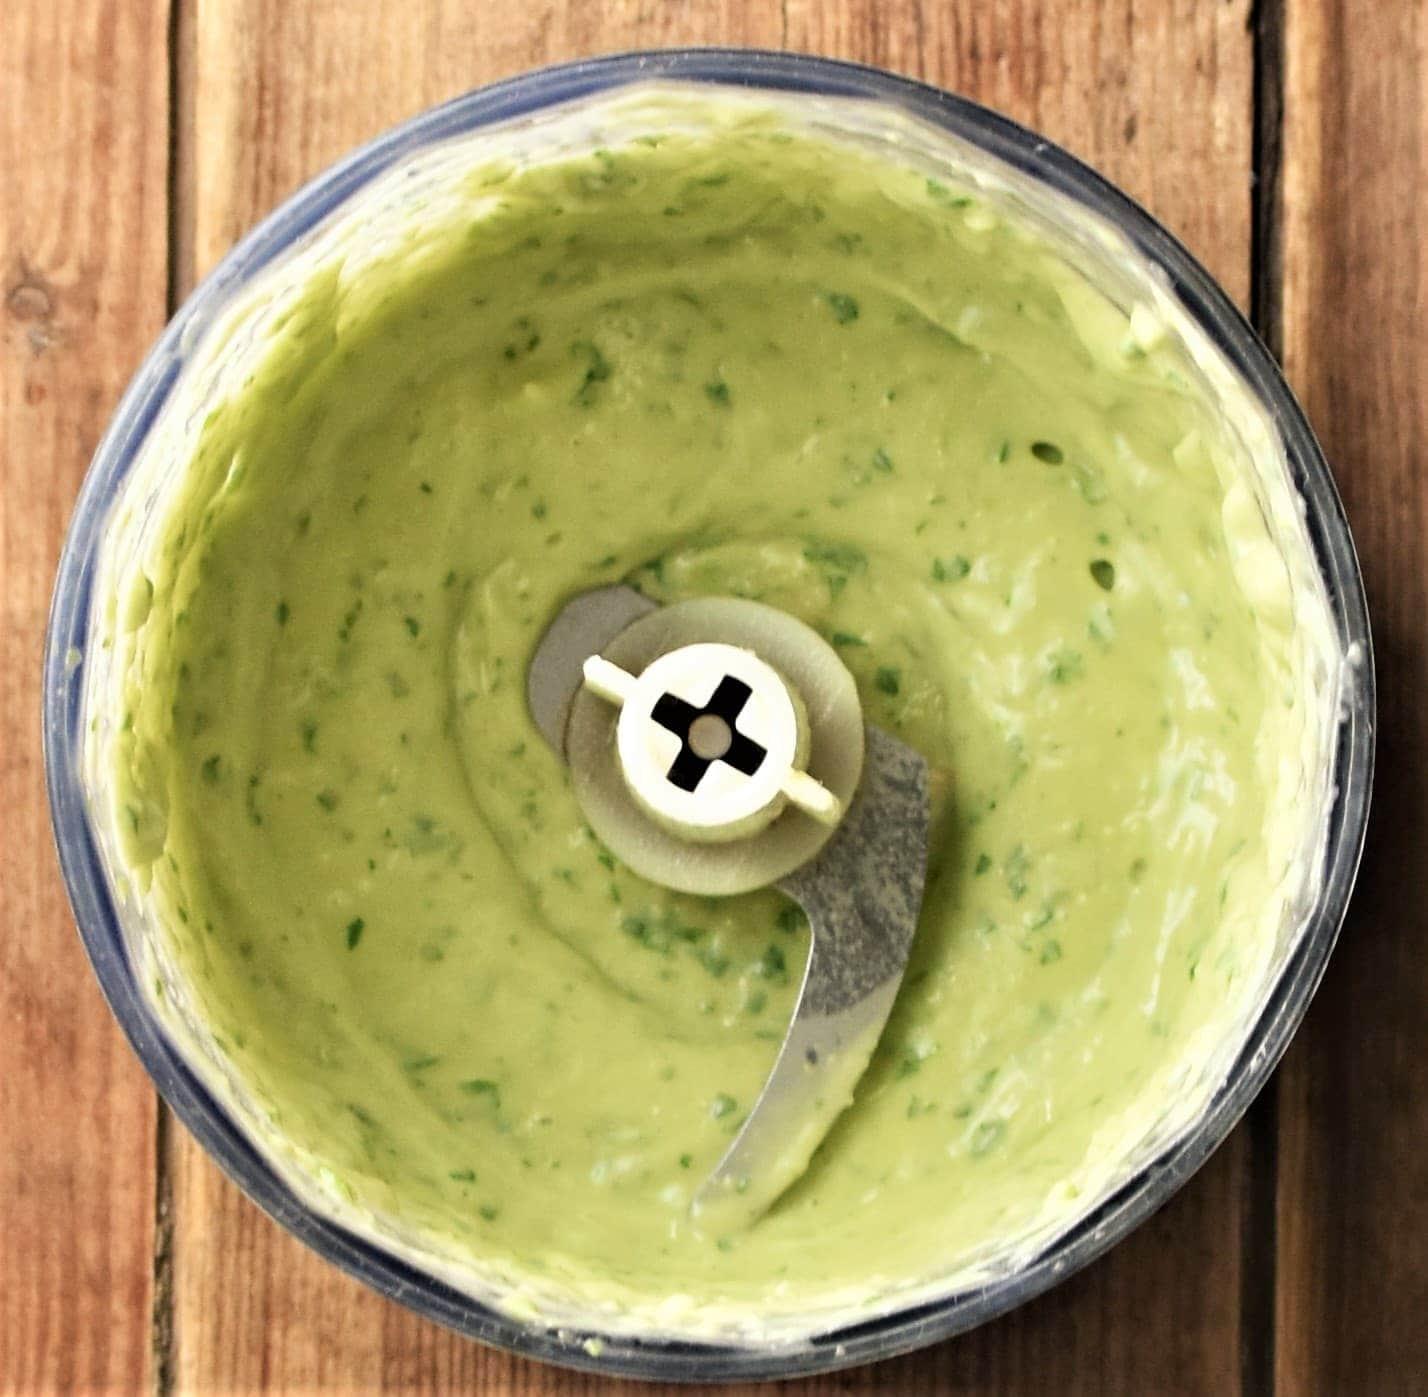 Creamy avocado sauce in blender.